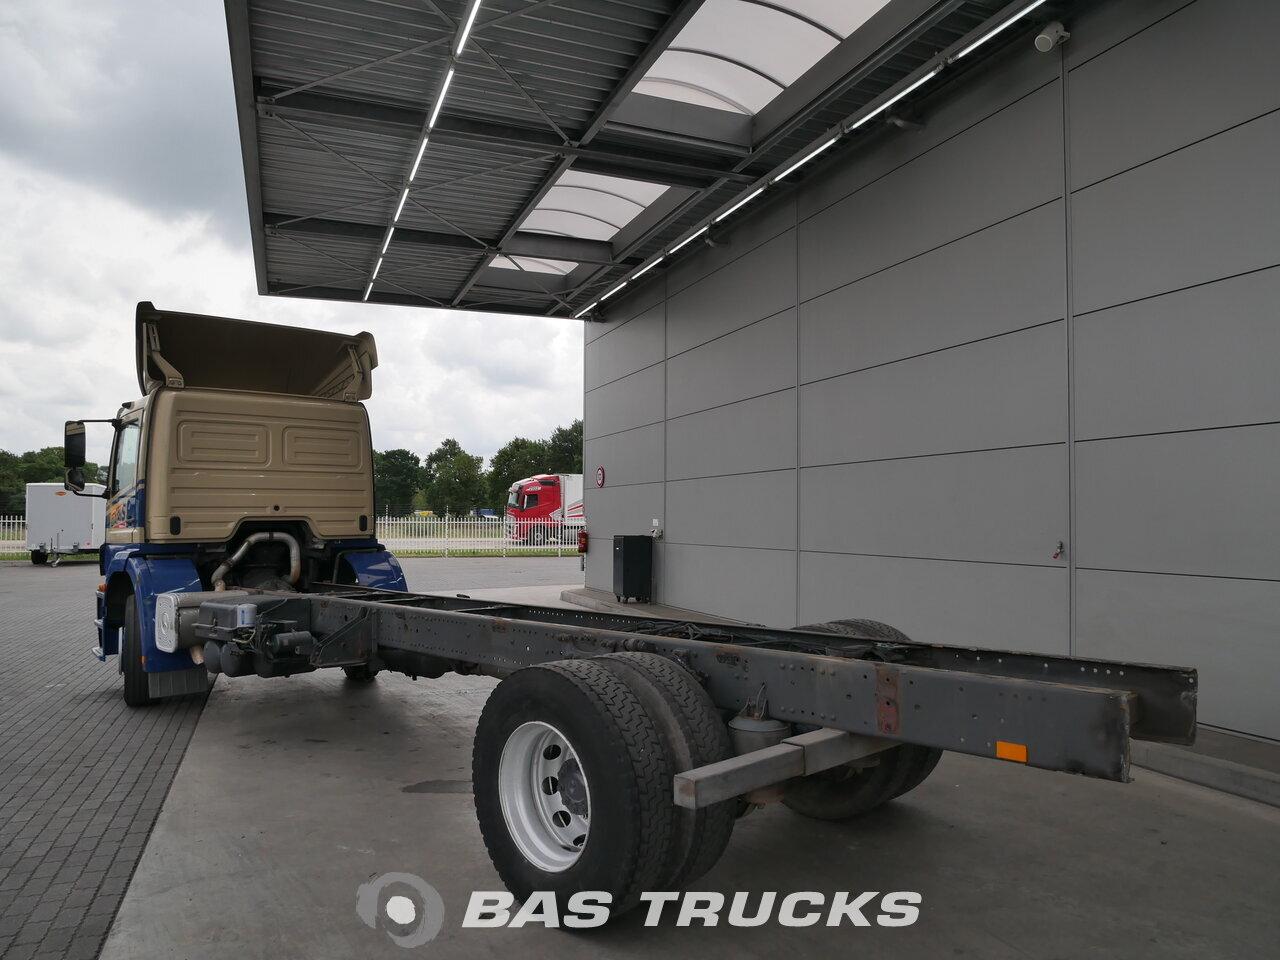 mercedes axor 1823 l lkw euro 3 7600 bas trucks. Black Bedroom Furniture Sets. Home Design Ideas